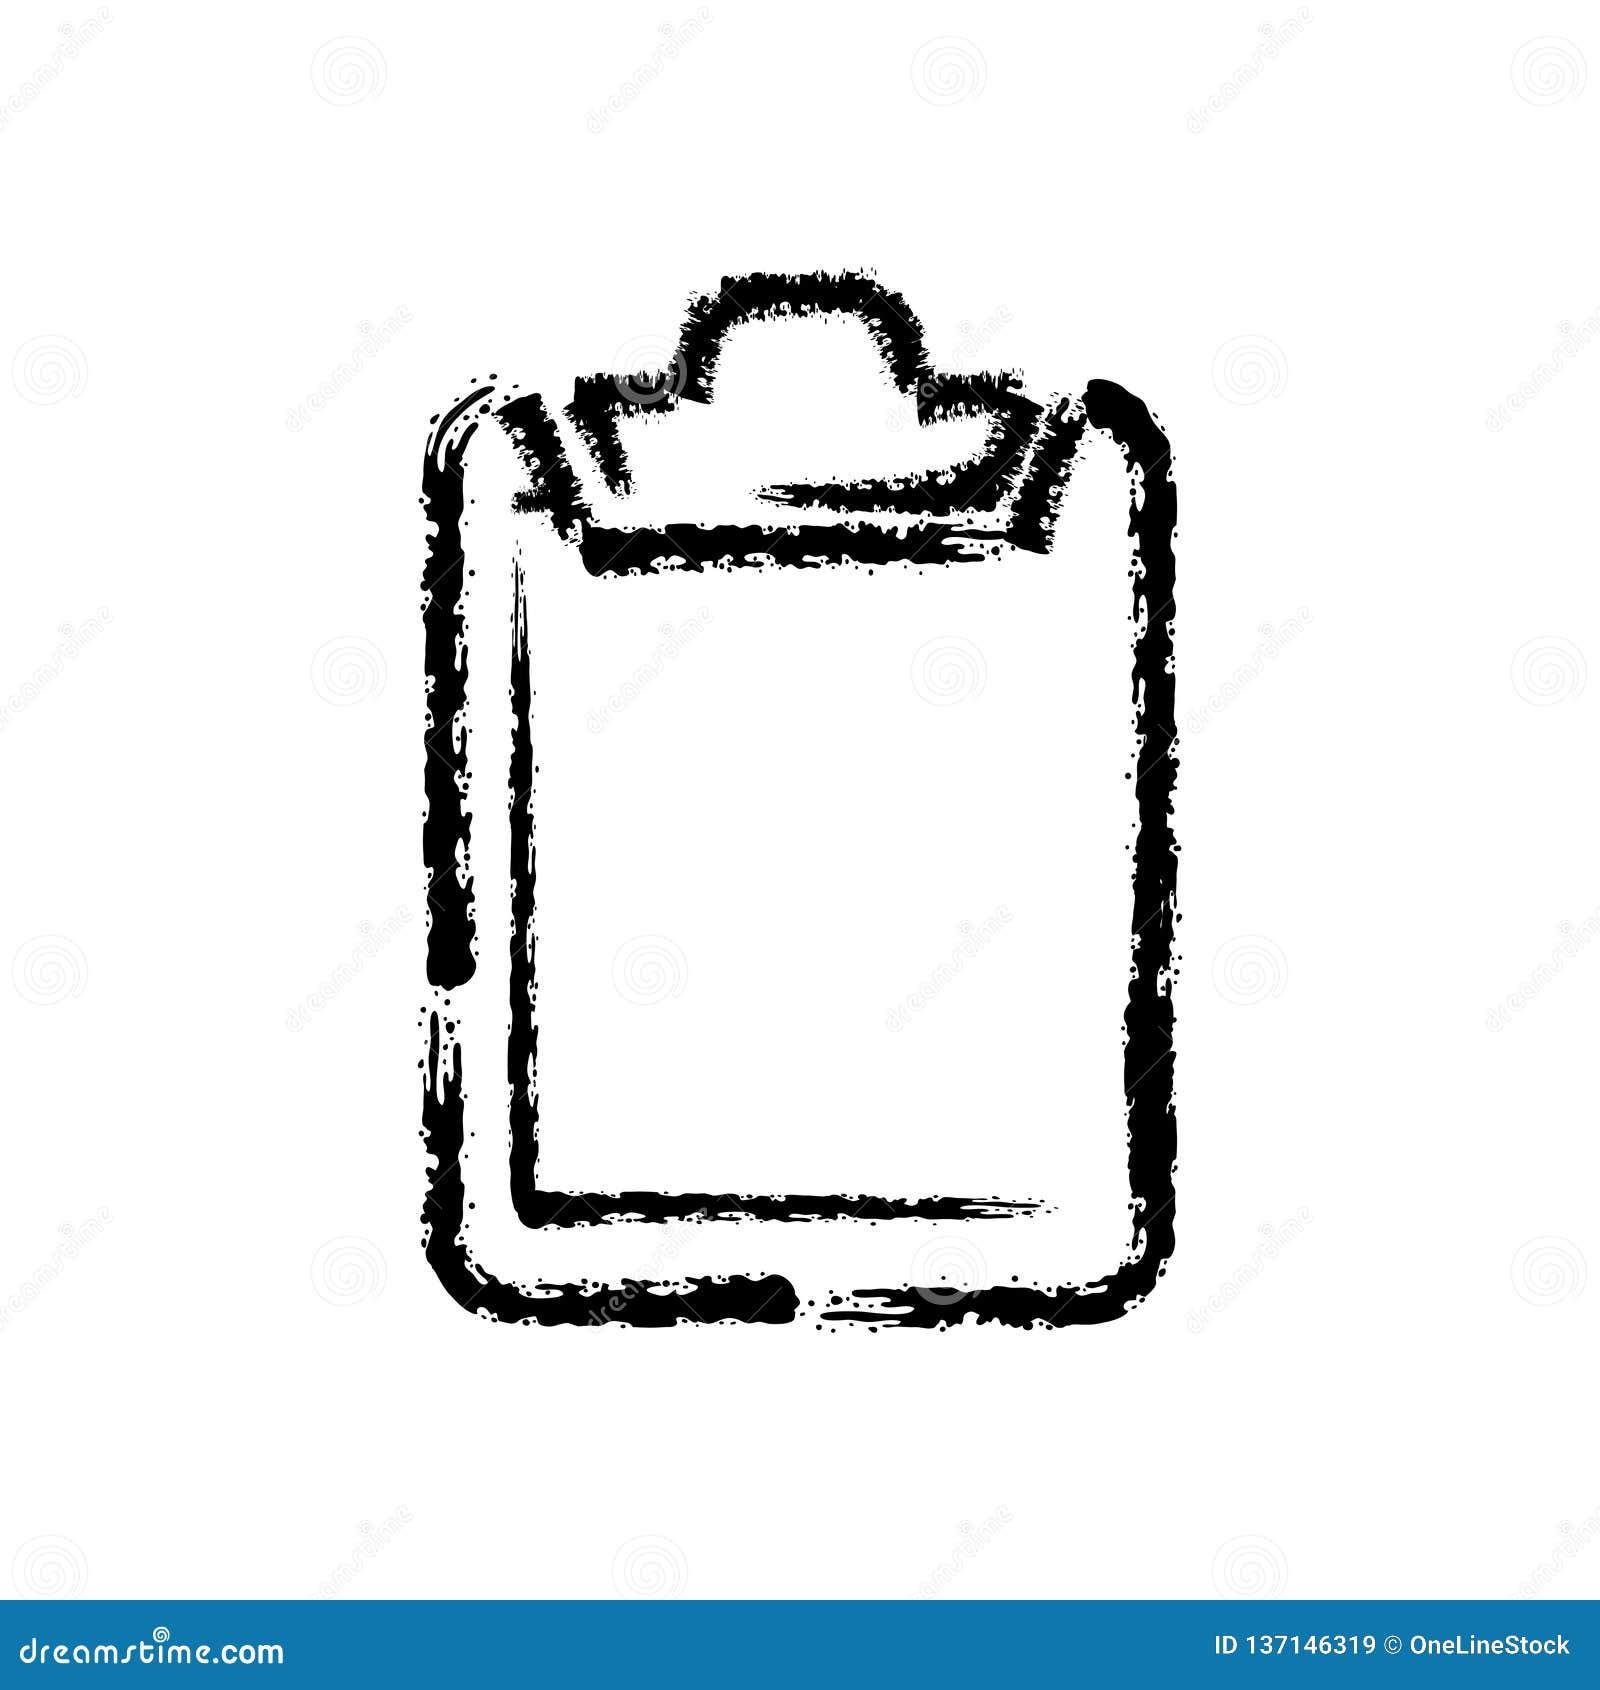 Bürstenanschlag-Handgezogene Ikone des Klemmbrettes